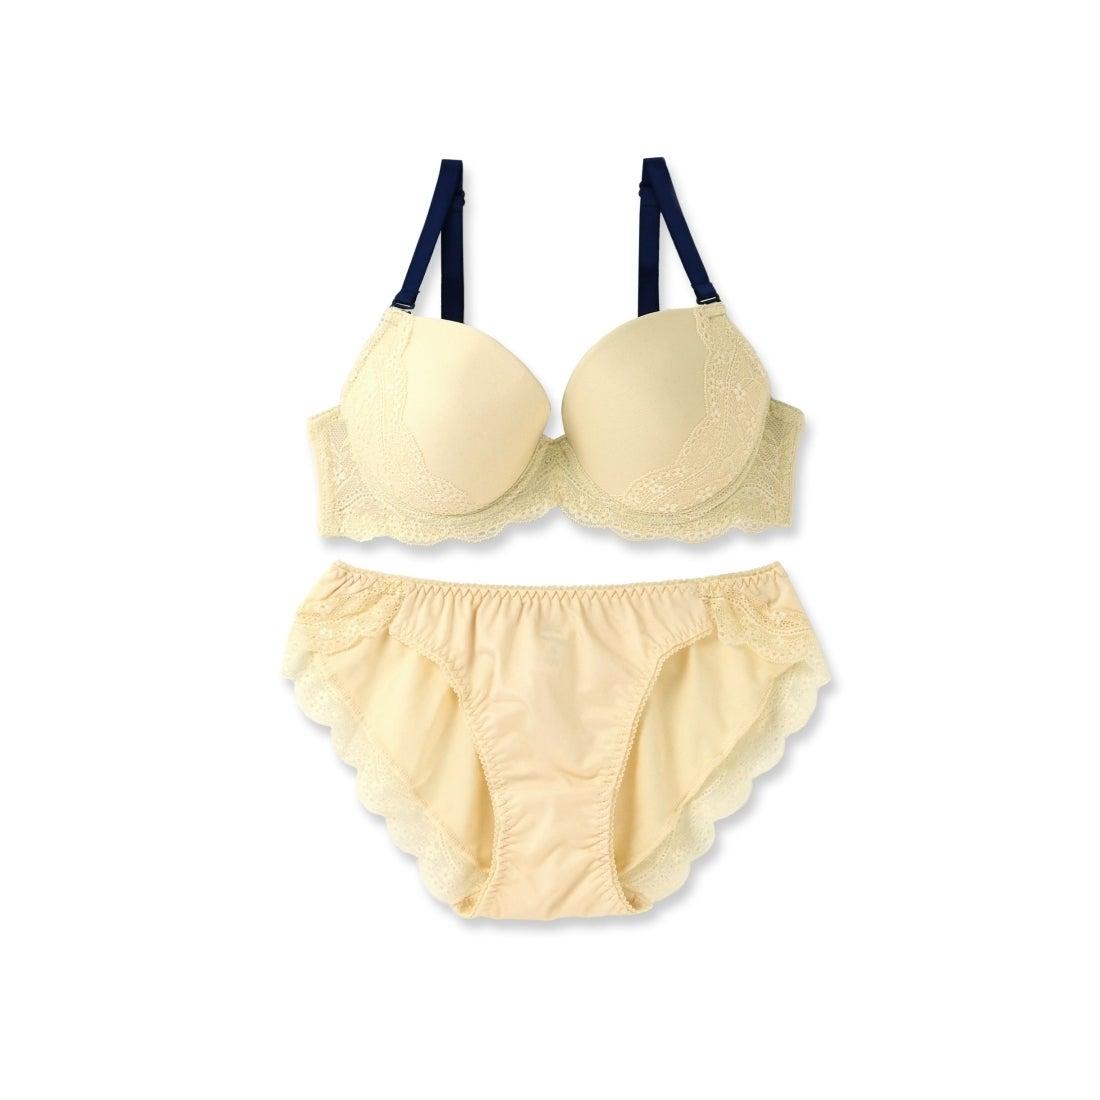 4803a3ed61716 フランデランジェリー fran de lingerie NudyBasic-fill-ヌーディーベーシックフィルブラ&ショーツセットB-Gカップ  (クリーム)-レディースファッション通販 ...